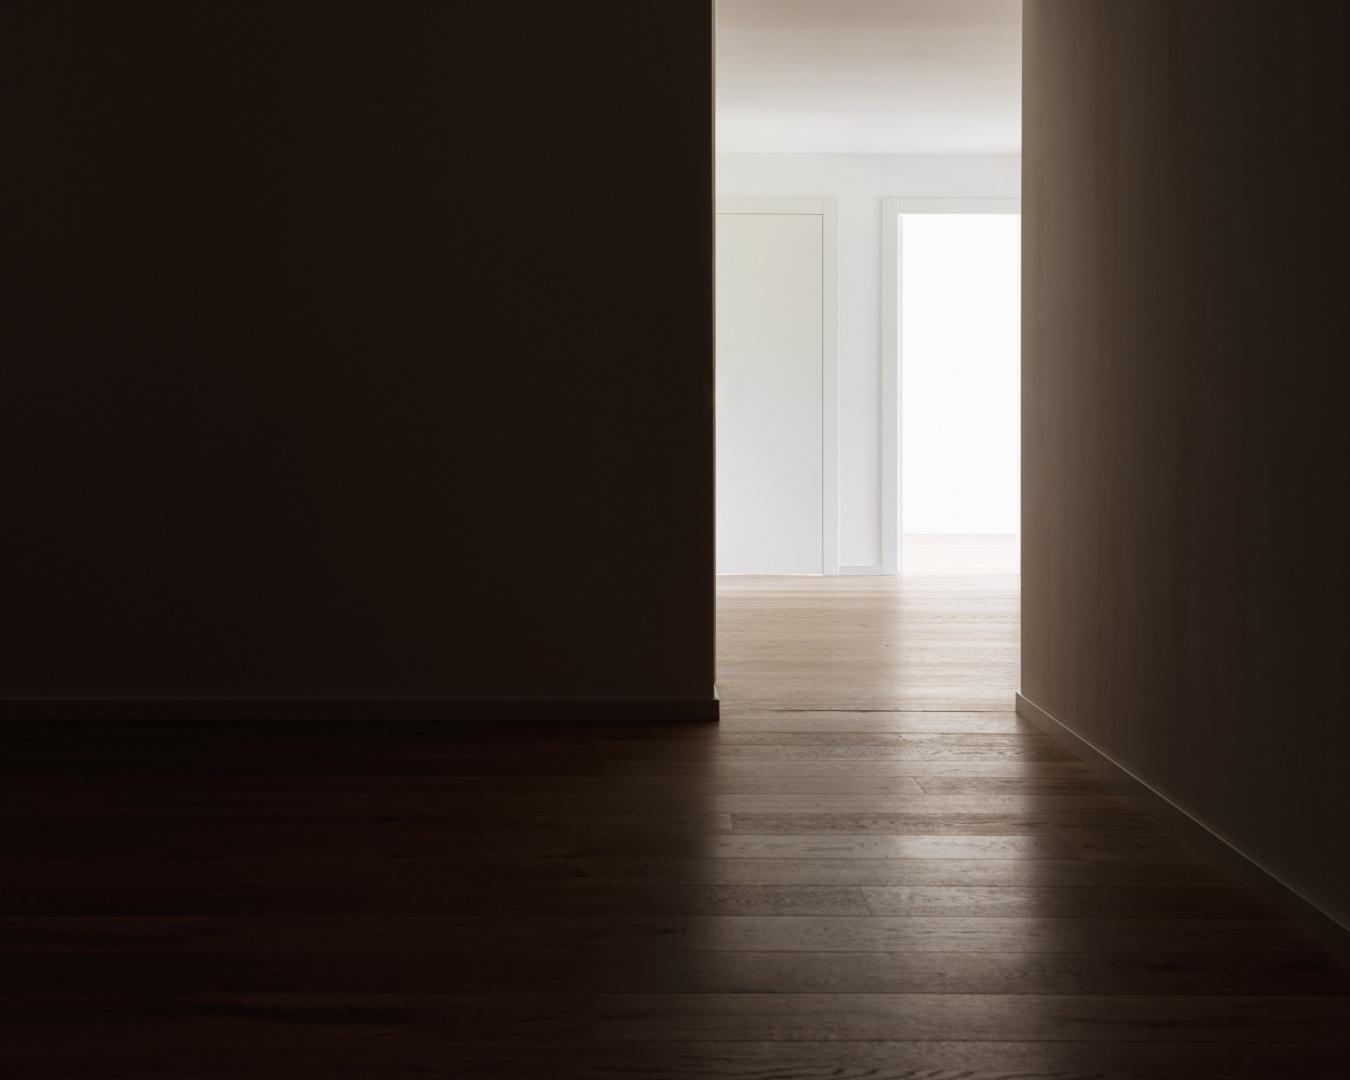 Korridor © Simone Bossi photographer